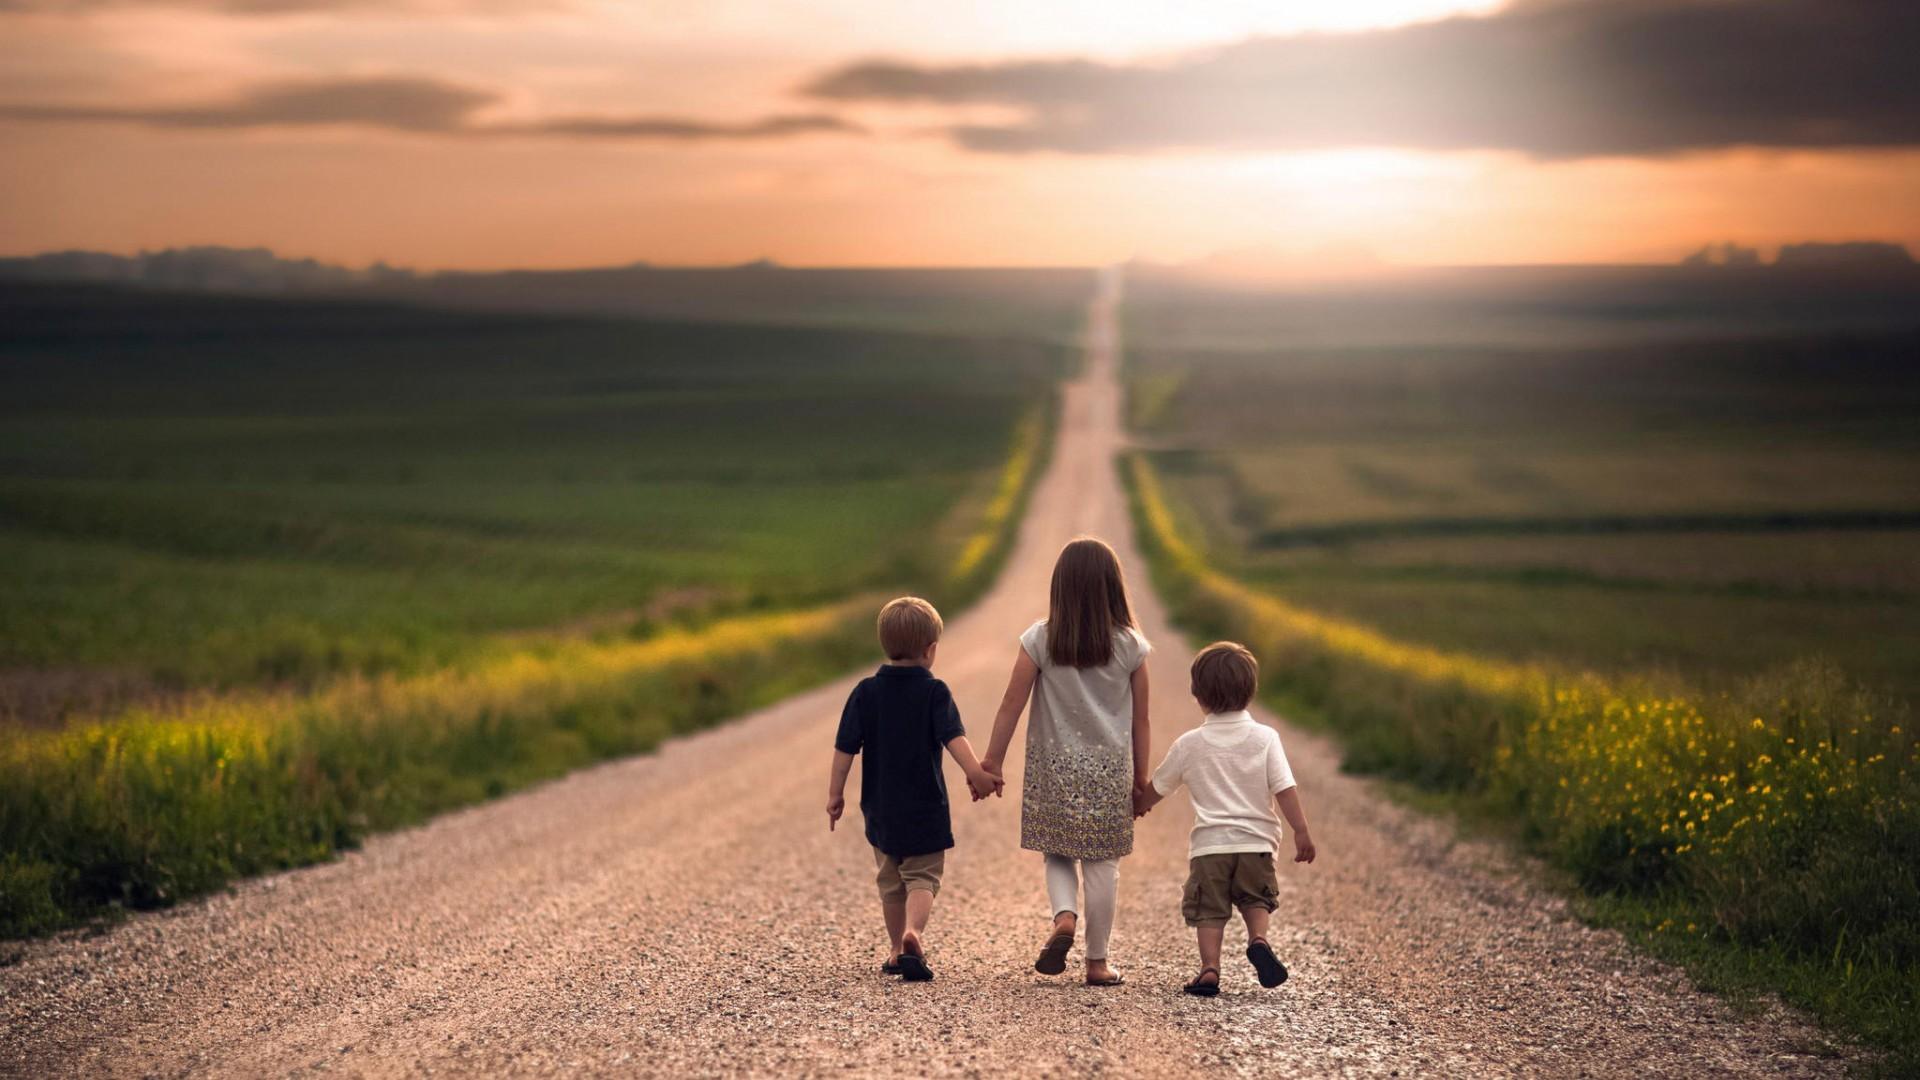 children path nature holding hands road nebraska natural lighting jake olson dirt road ...